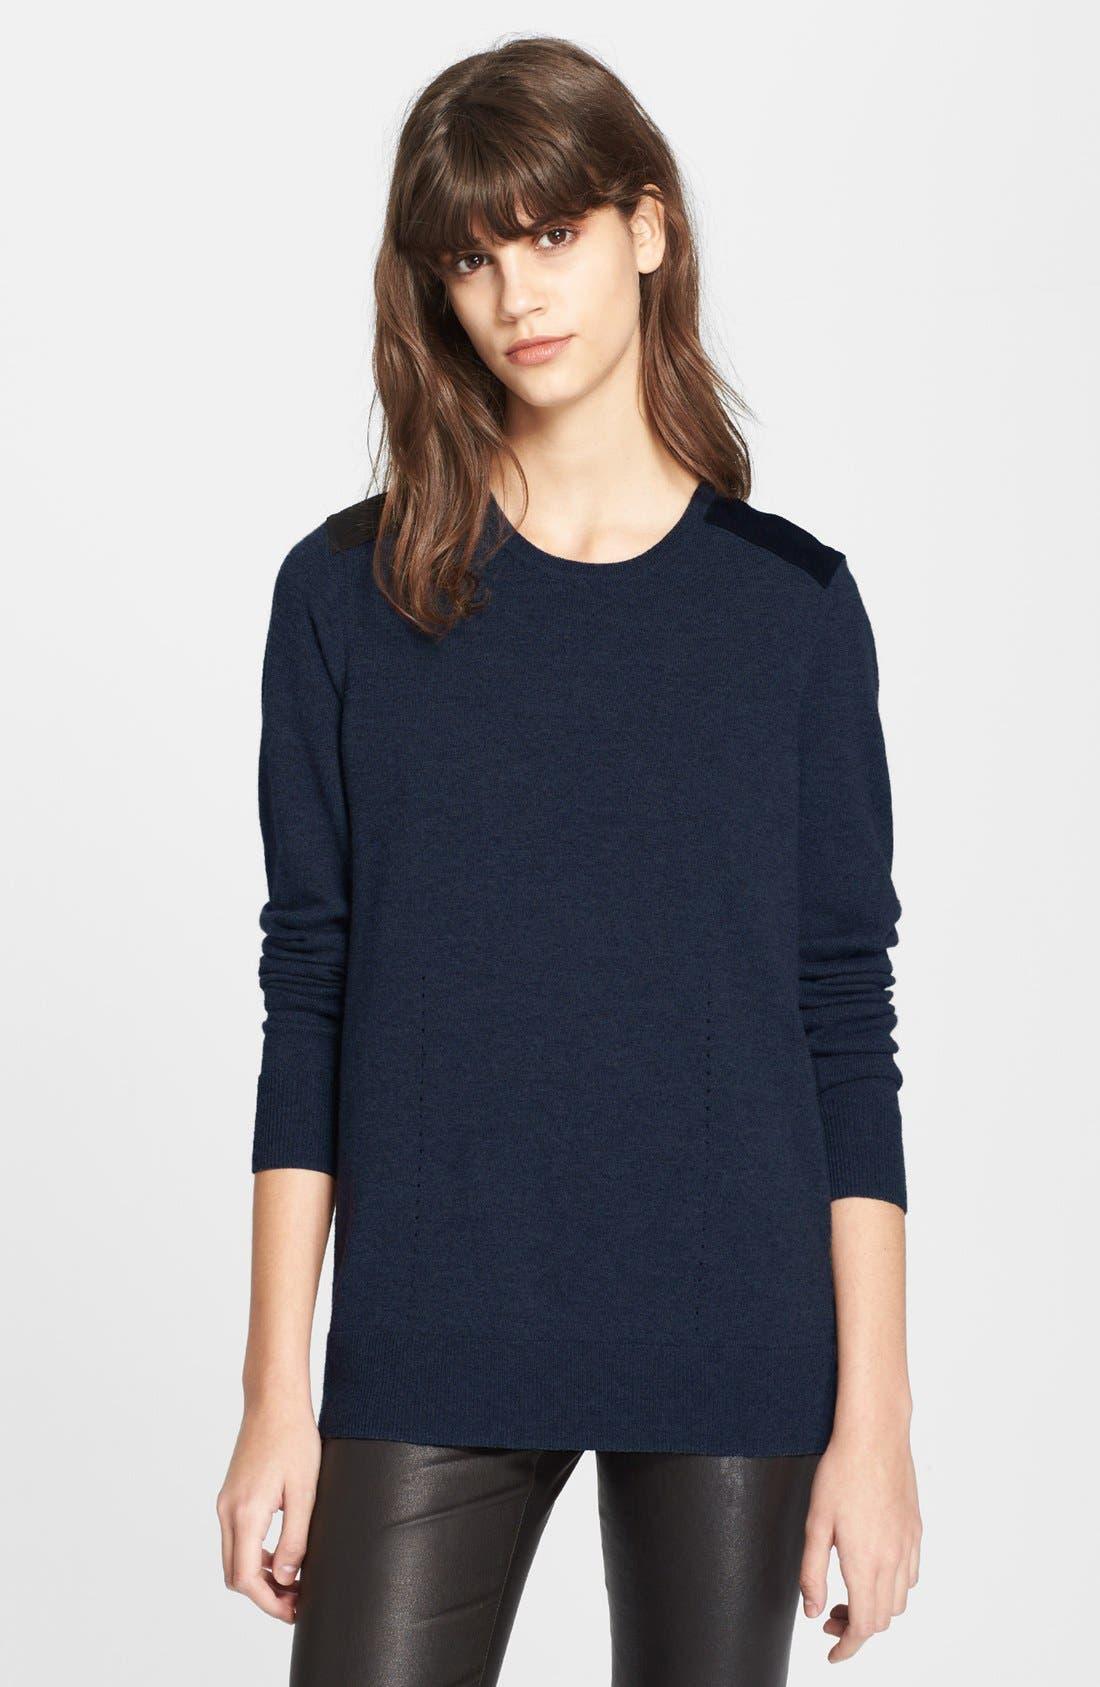 Alternate Image 1 Selected - rag & bone 'Maribel' Suede Shoulder Sweater